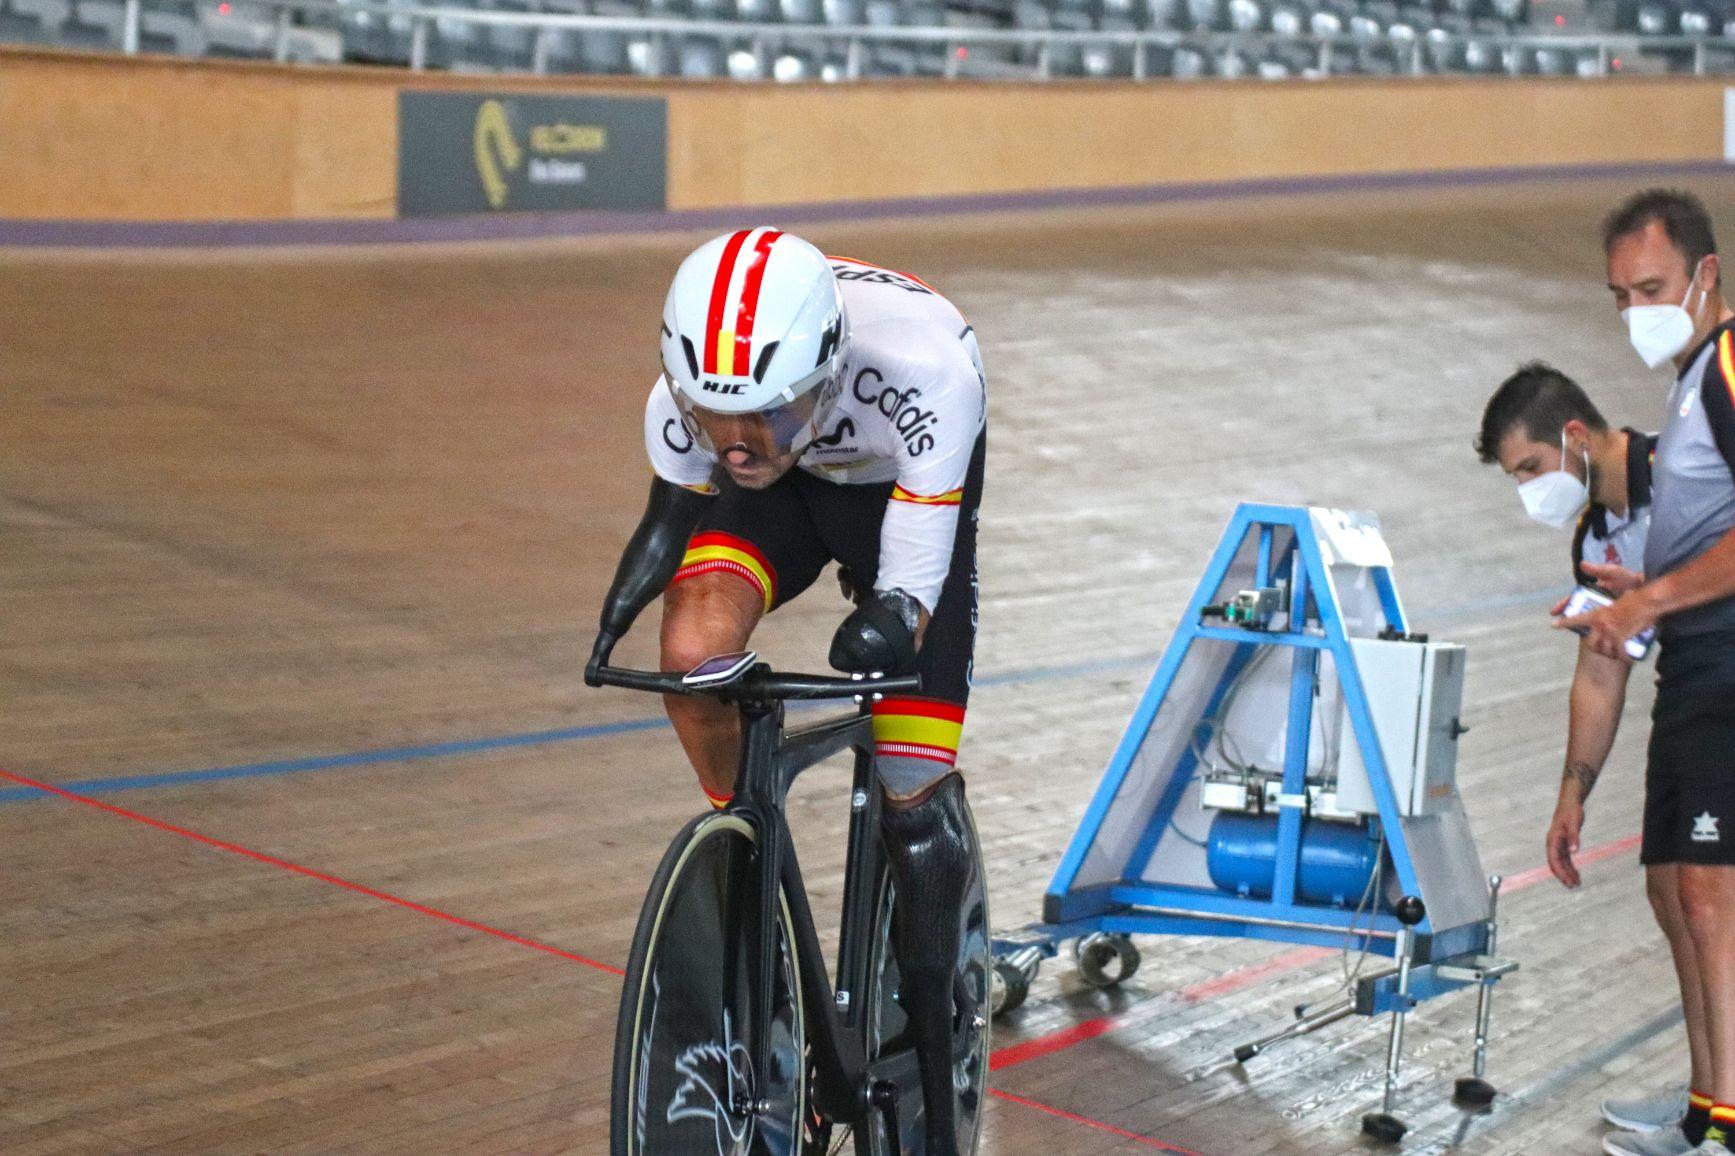 #TeamESPciclismo - Concentración en Mallorca previa a los Juegos Paralímpicos